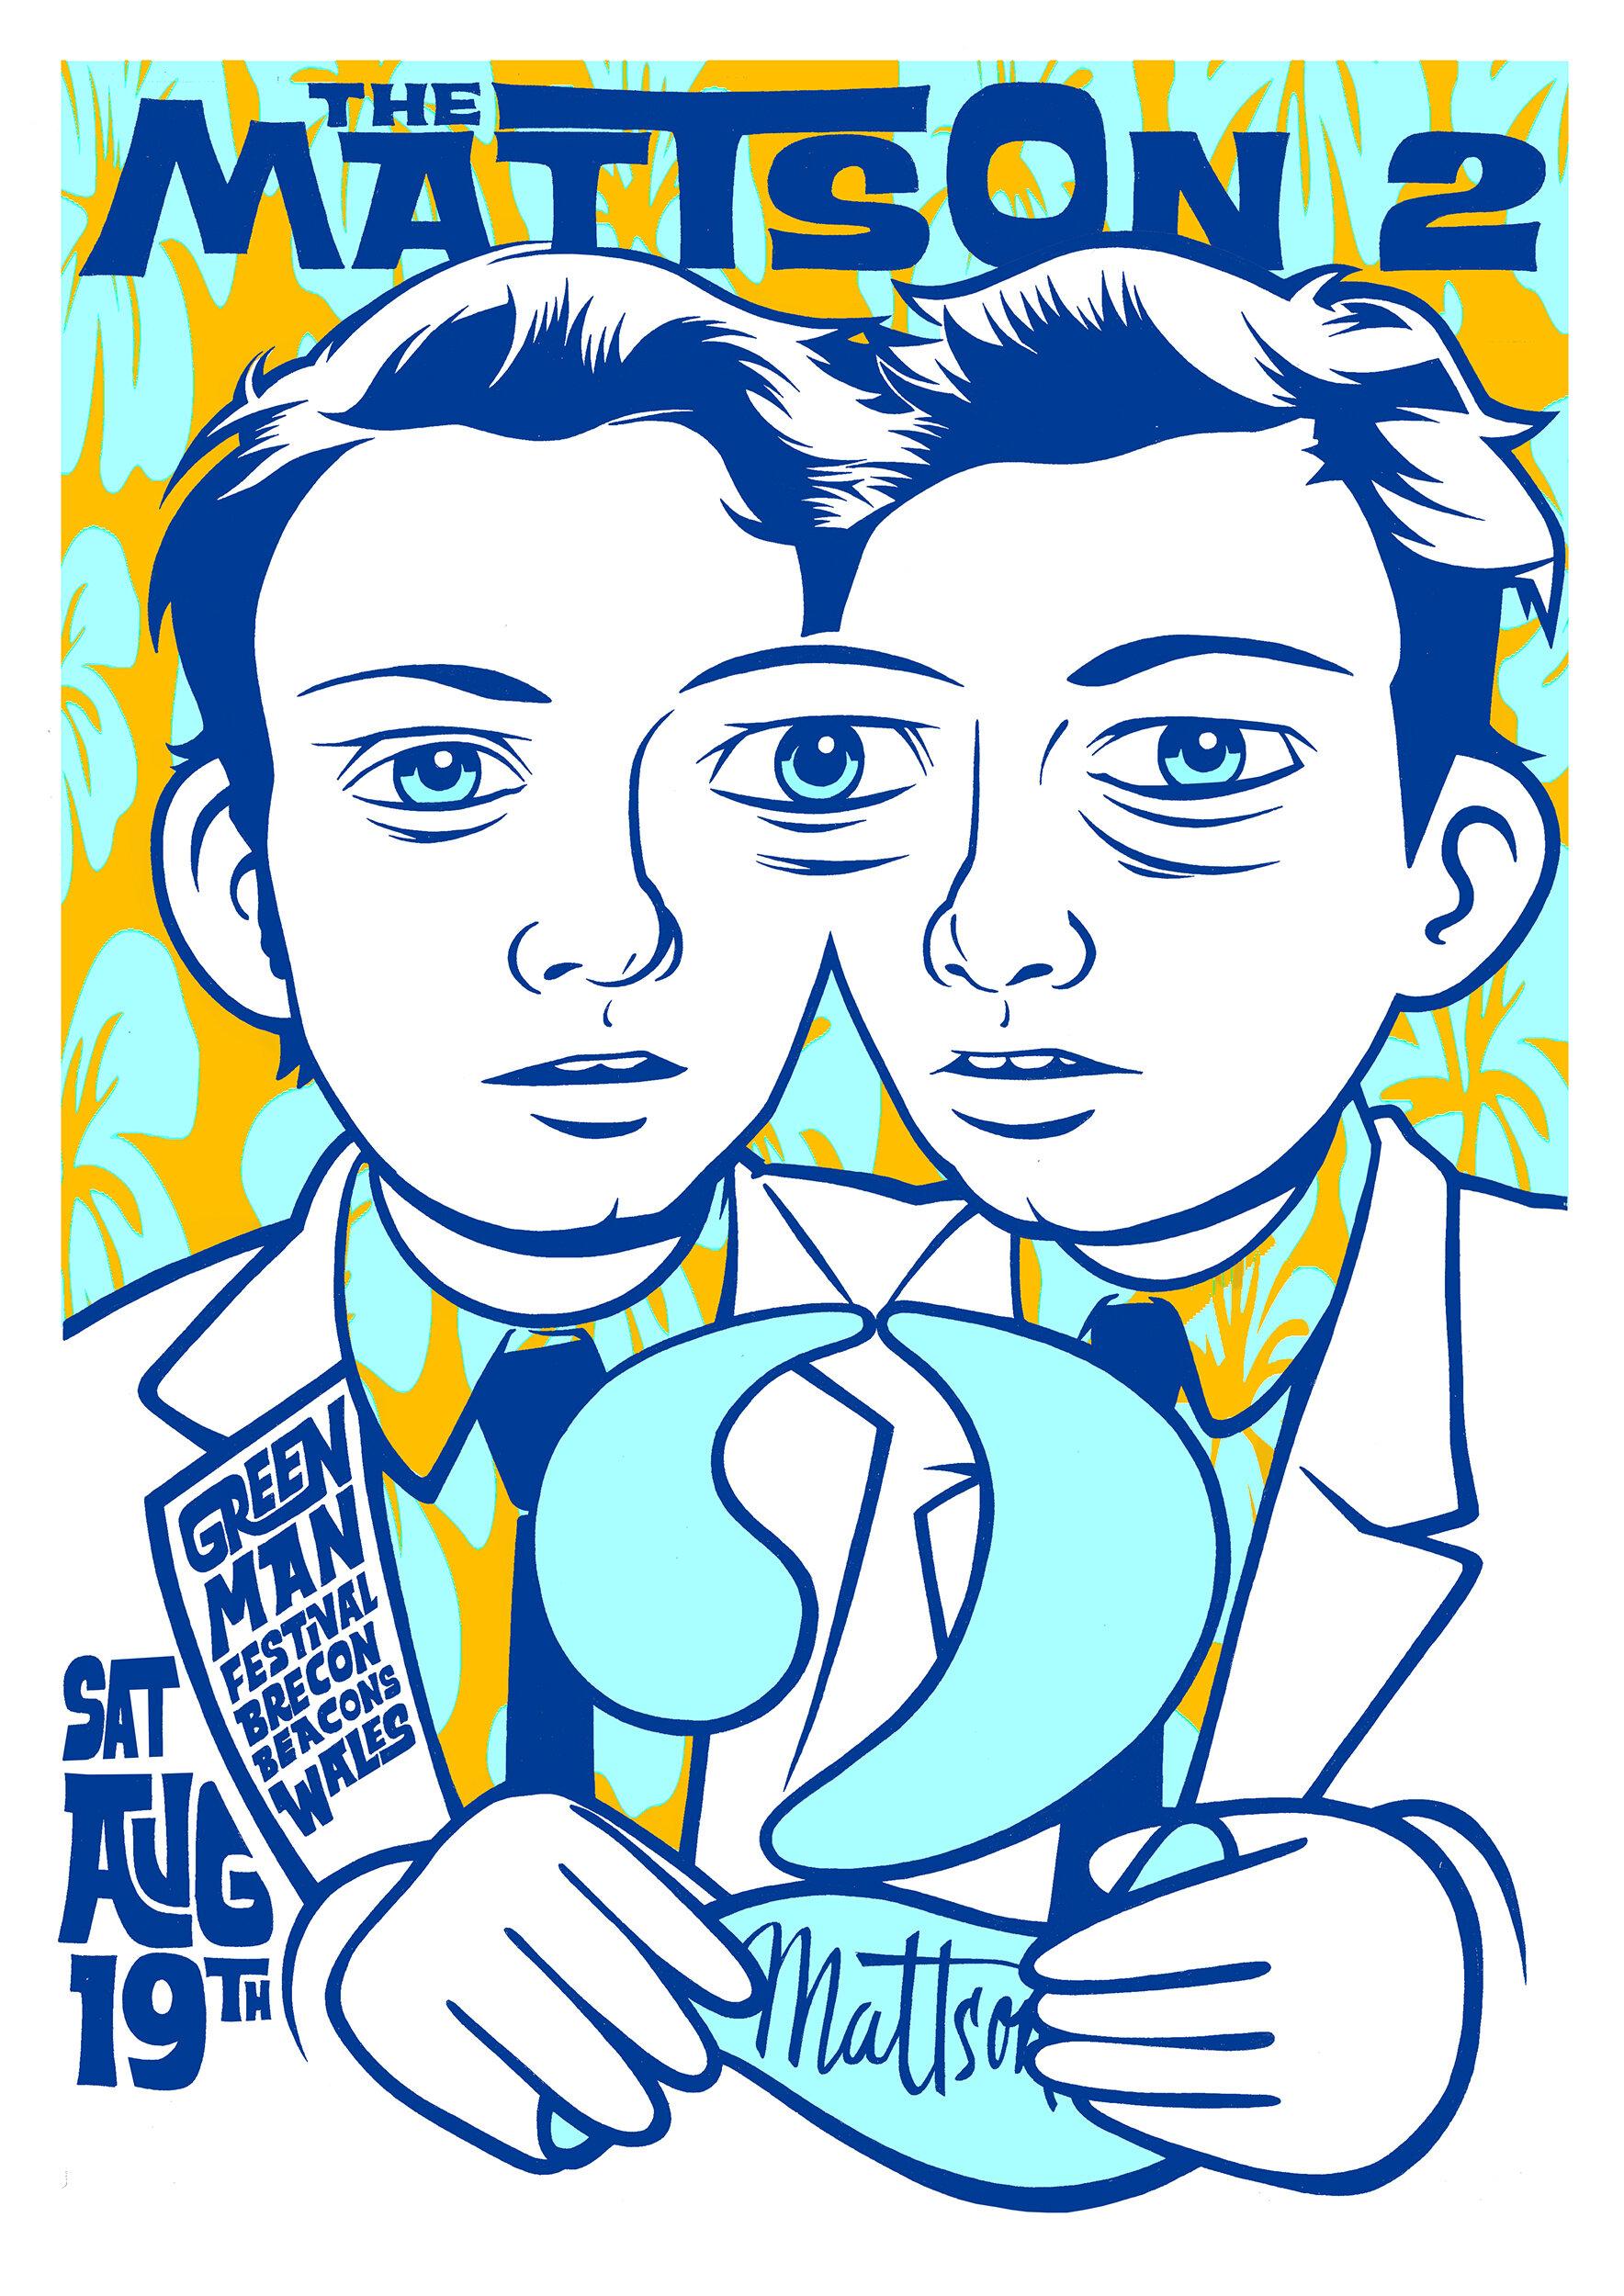 The Mattson 2 poster.